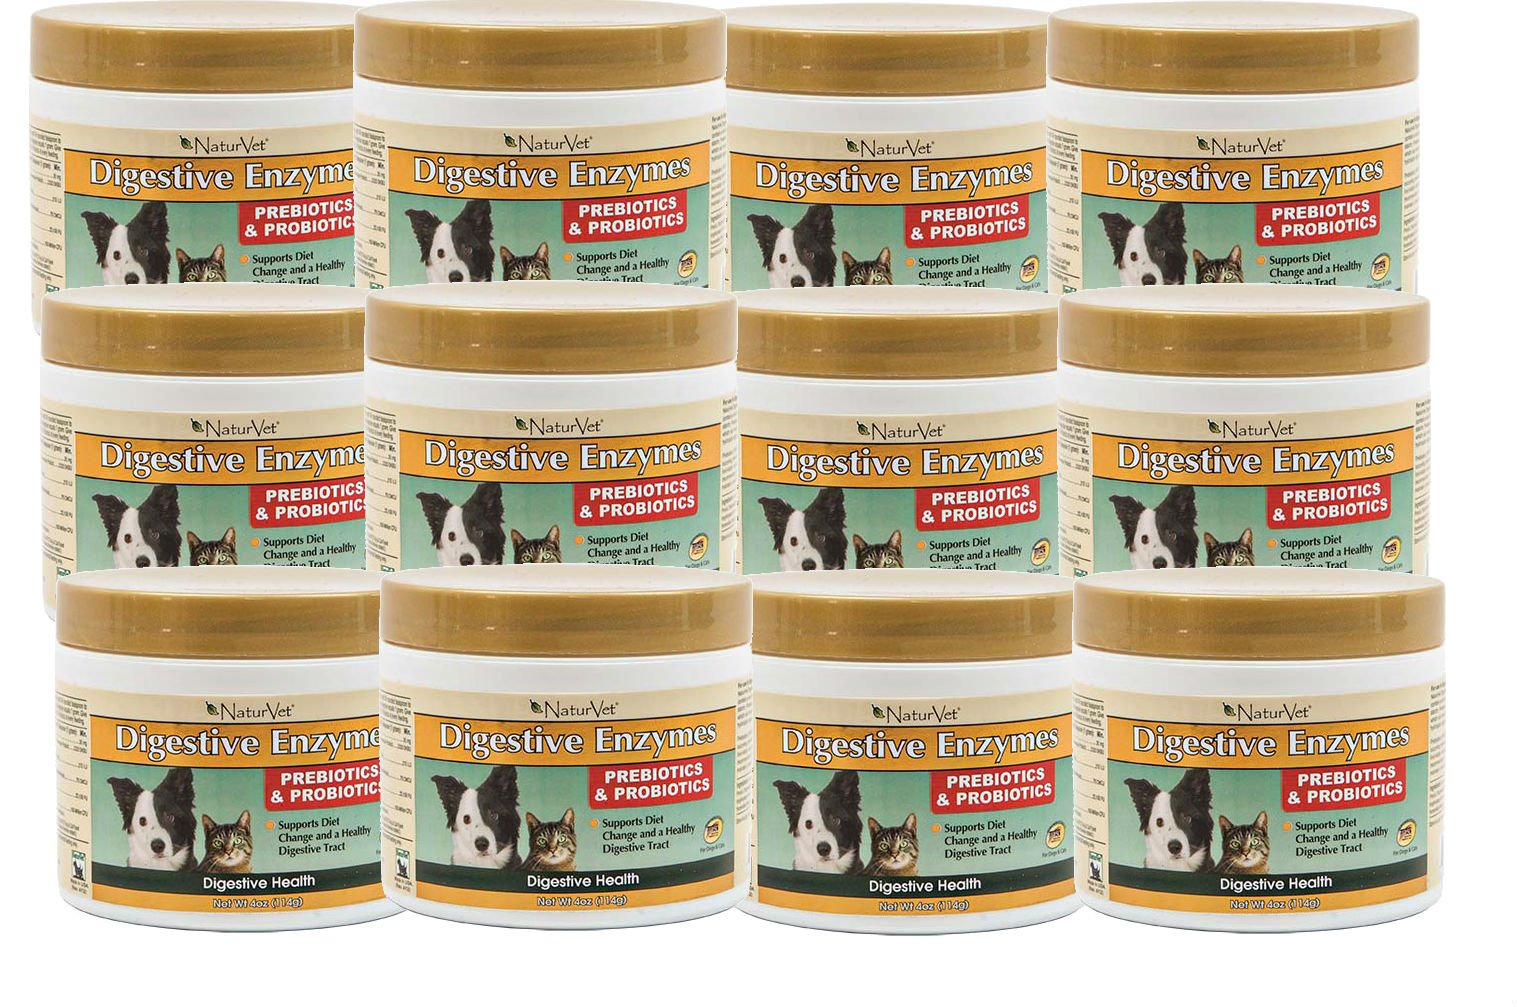 NaturVet DIGESTIVE ENZYMES & PROBIOTICS Healthy Digestion Dogs & Cat 4oz 12PACK